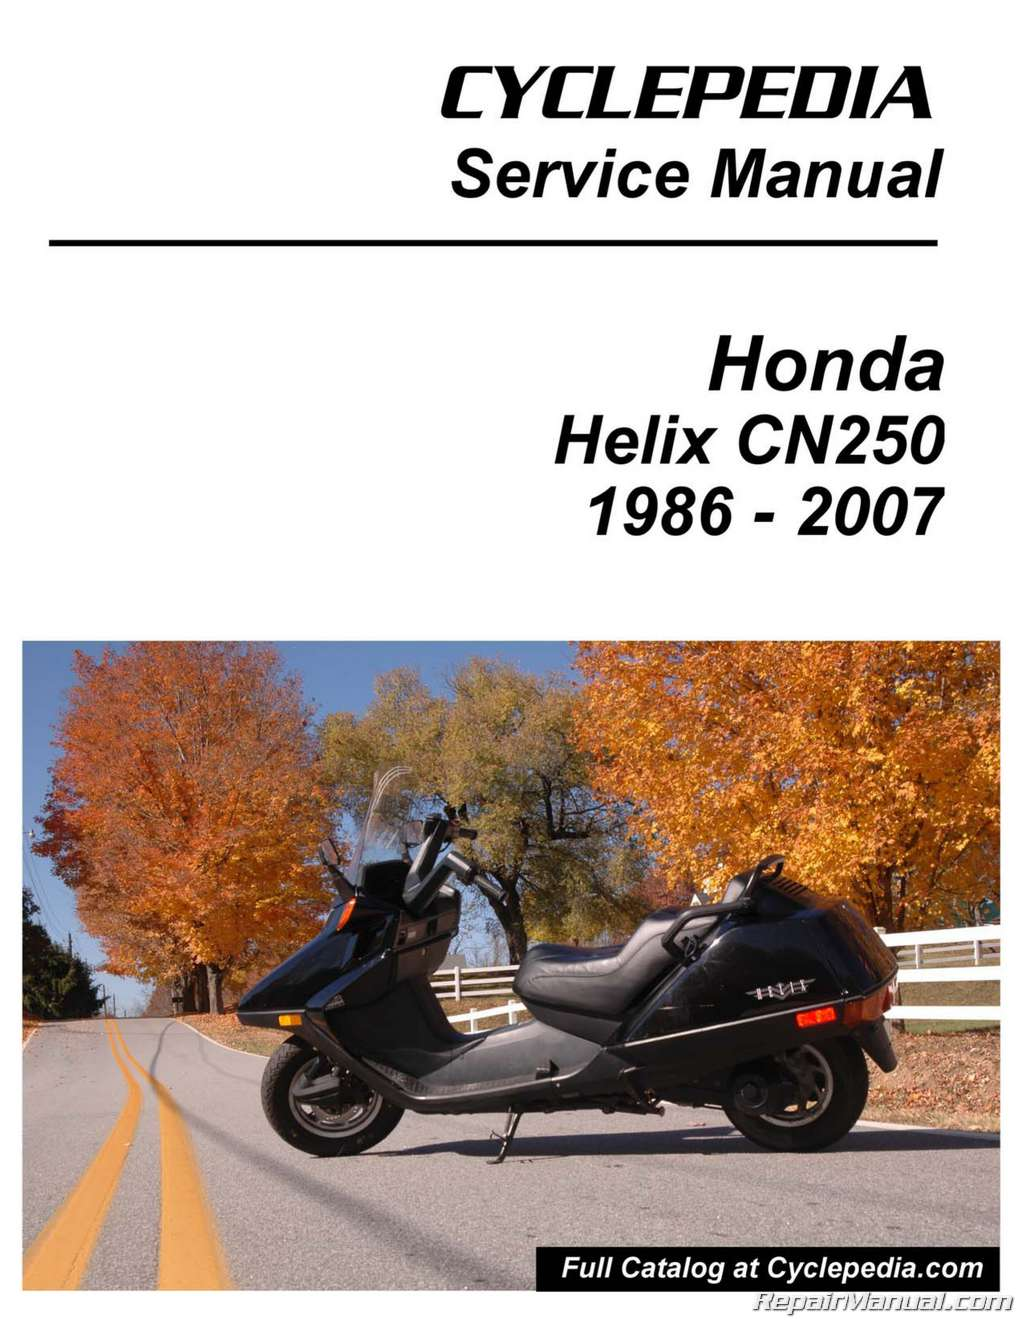 Honda Manual Scooter Auto Electrical Wiring Diagram Diagrams 2003 Yamaha Zuma Moped